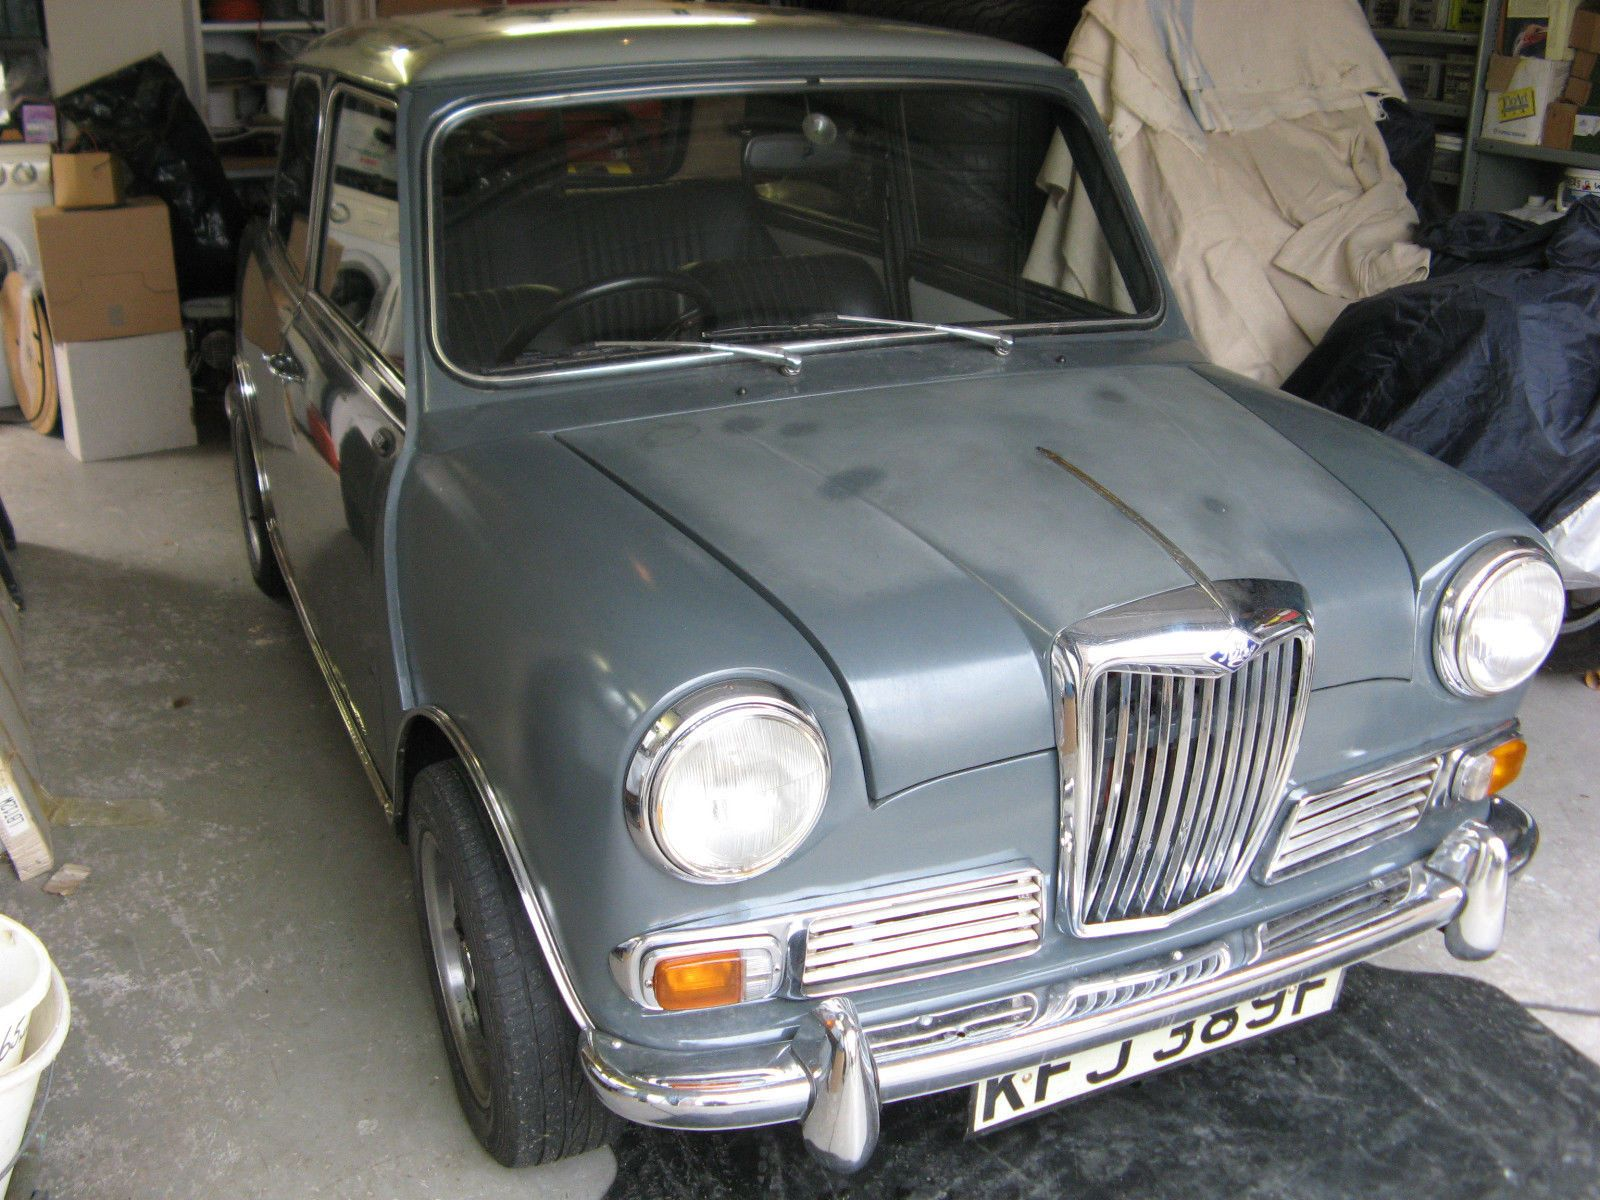 TAX EXEMPT 1967 MINI RILEY ELF CLASSIC CAR | eBay | Riley Elf ...